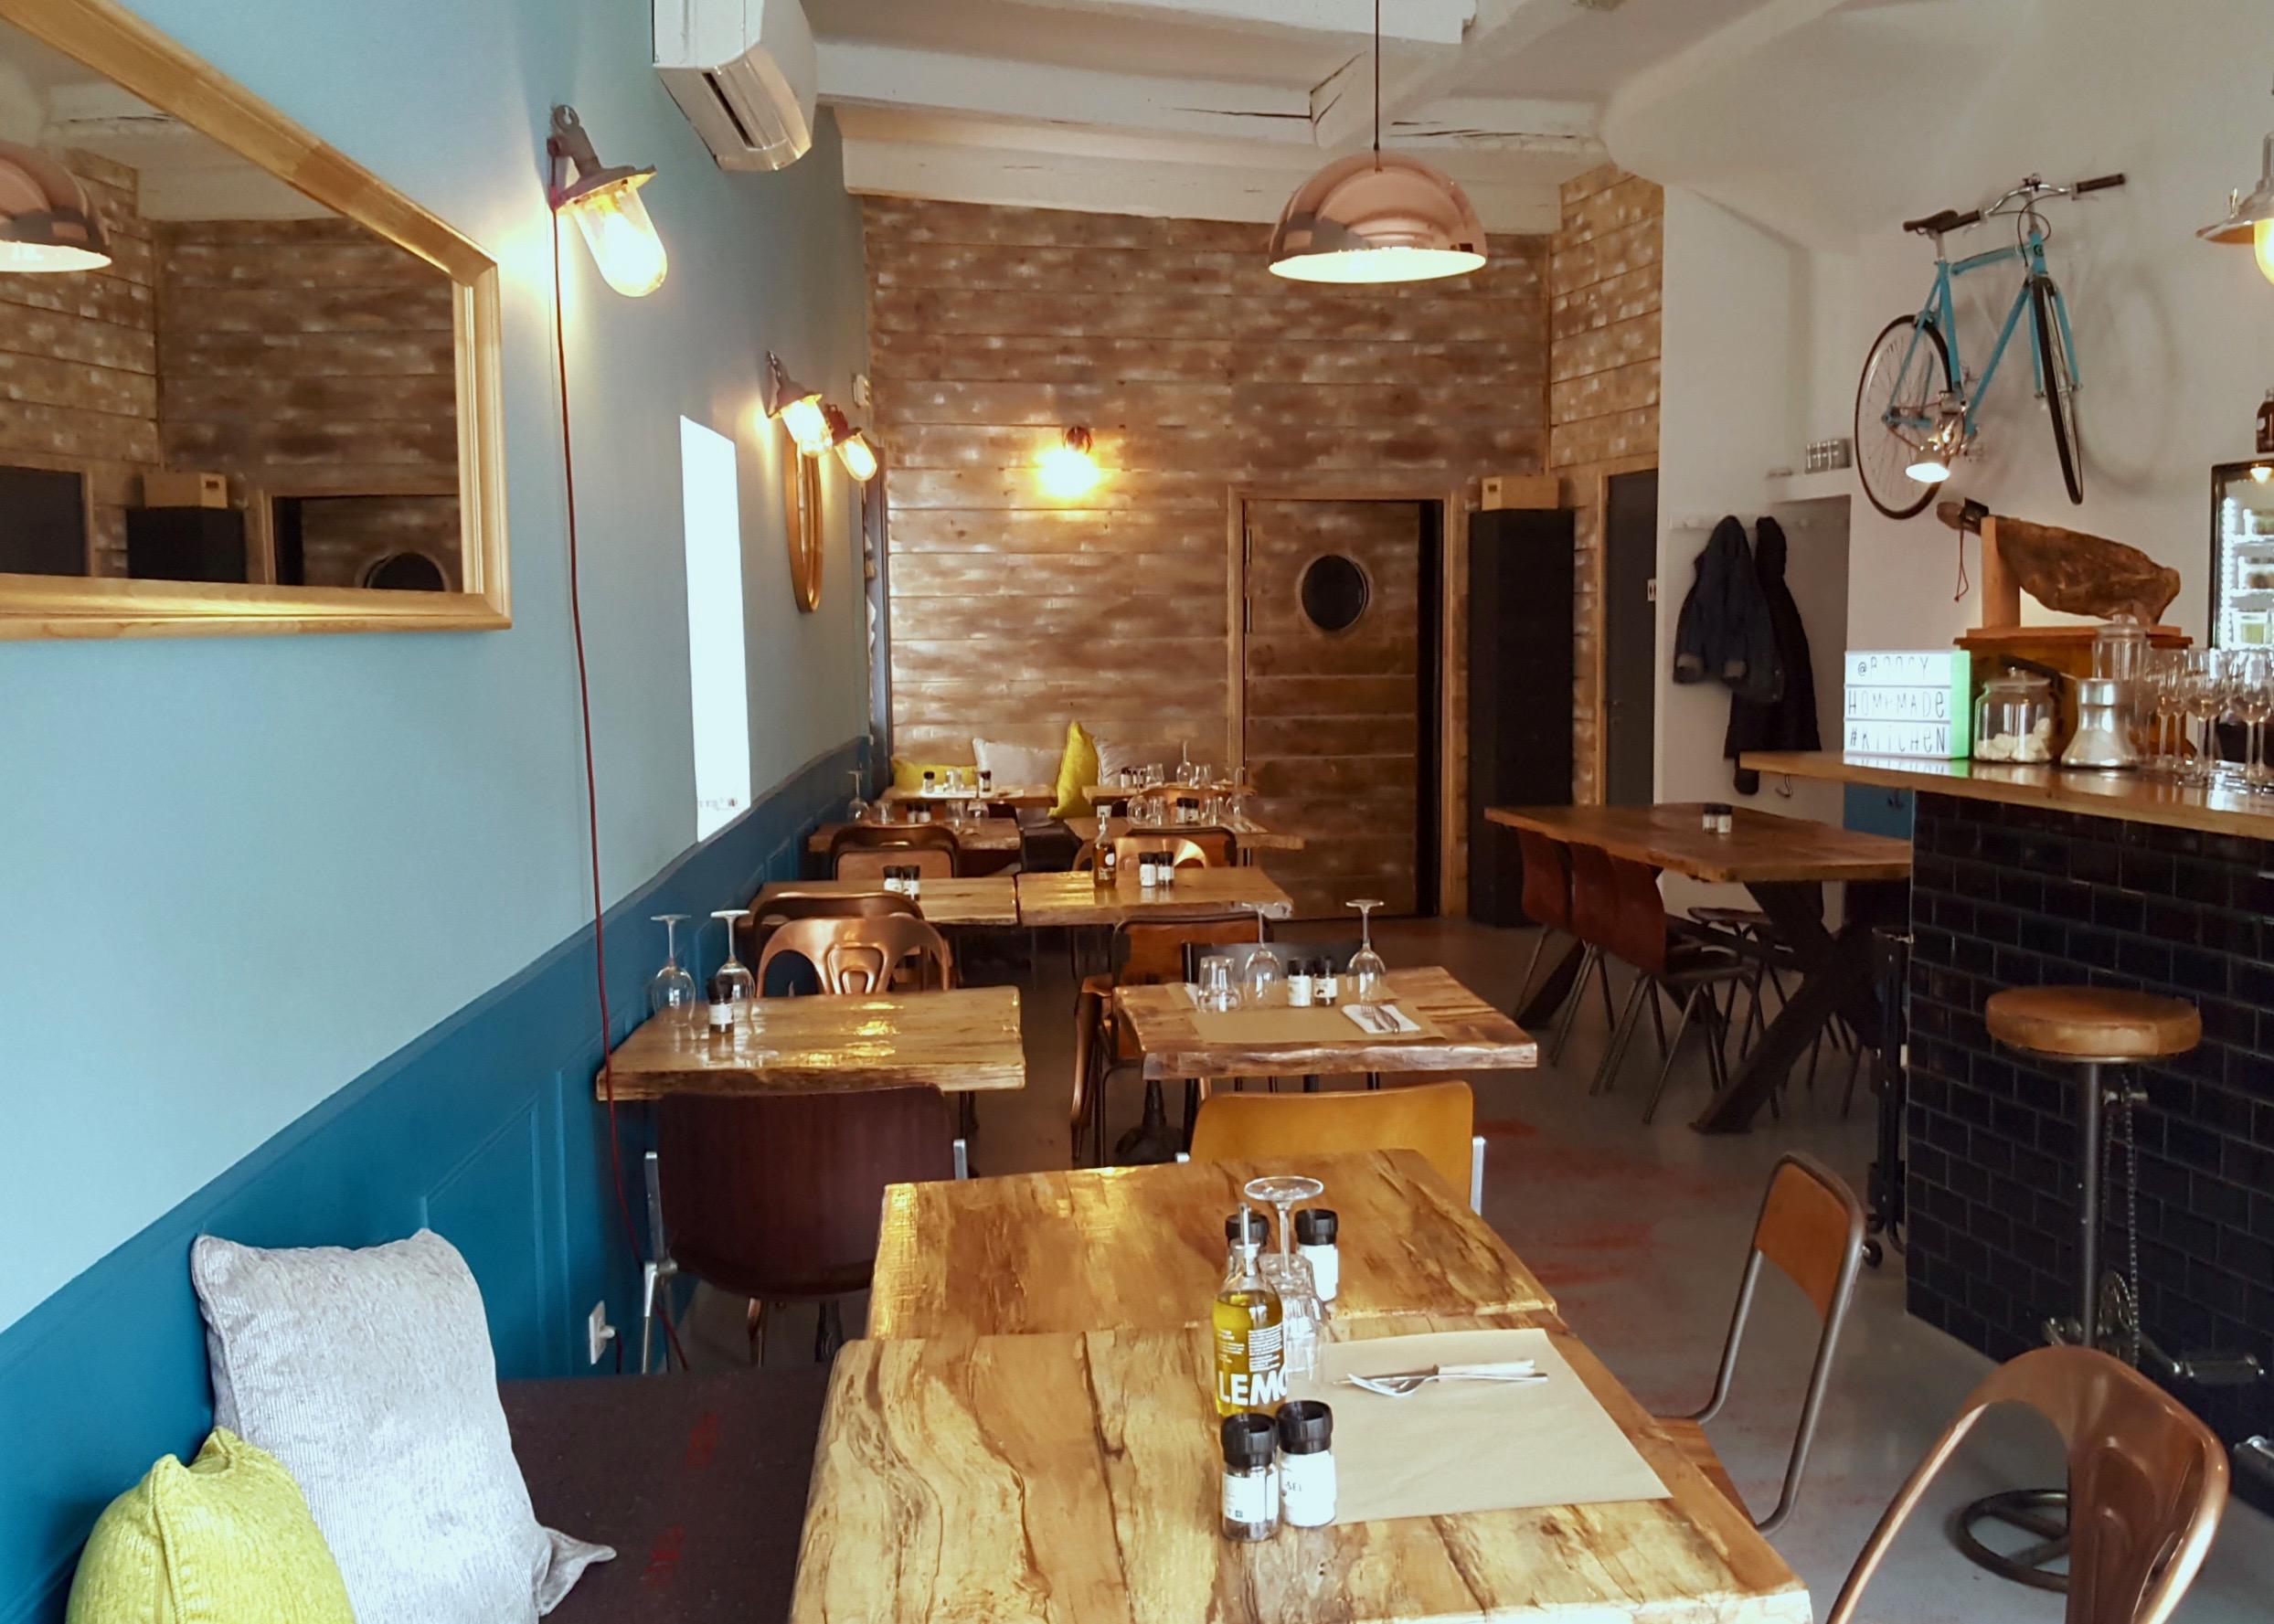 Cuisine italienne et burgers la salle manger love spots for Restaurant salle a manger tunis